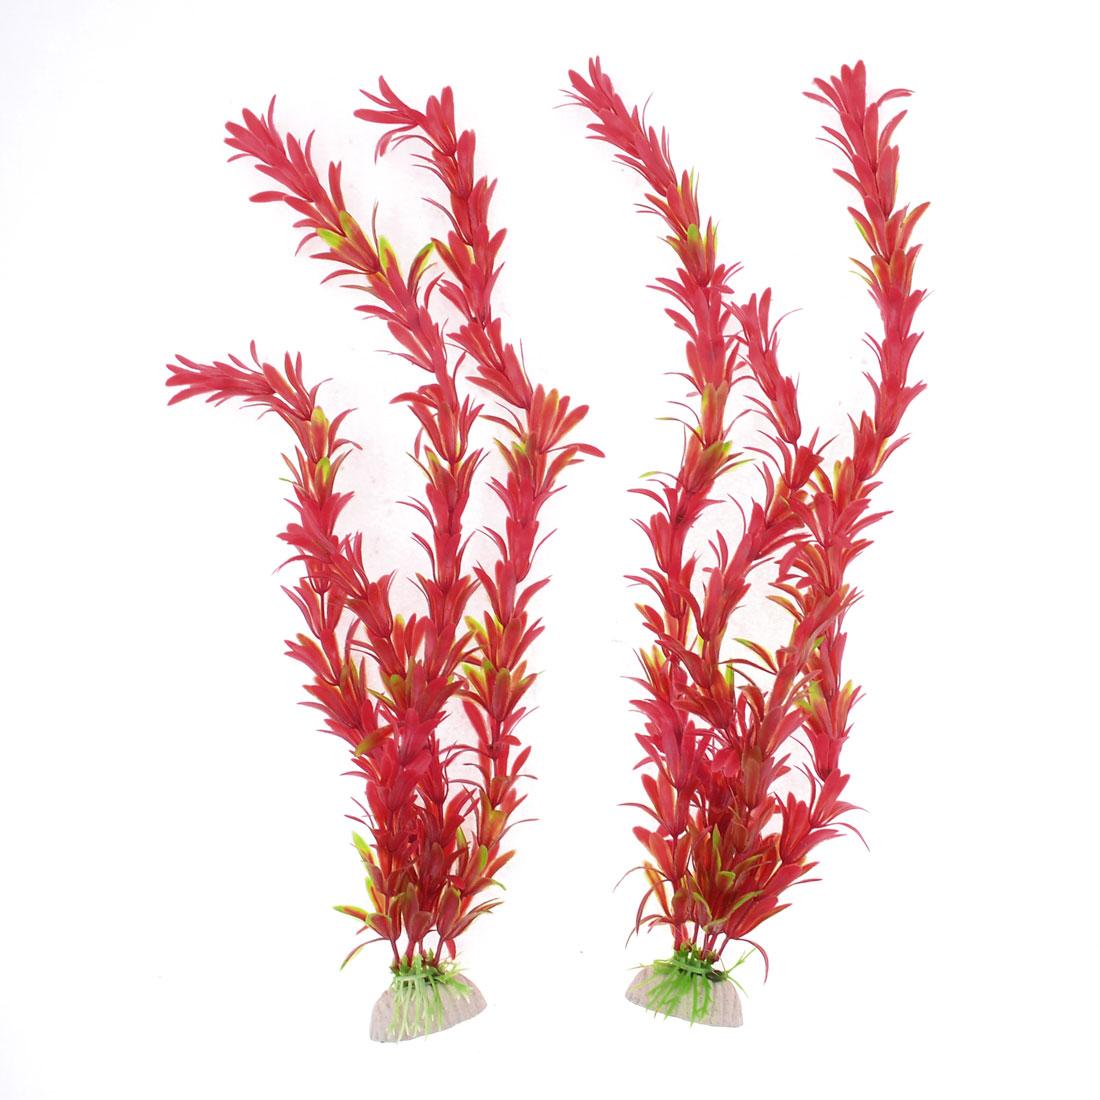 "2 Pcs 14.2"" Height Red Plastic Plant Decor for Aquarium Fish Tank"